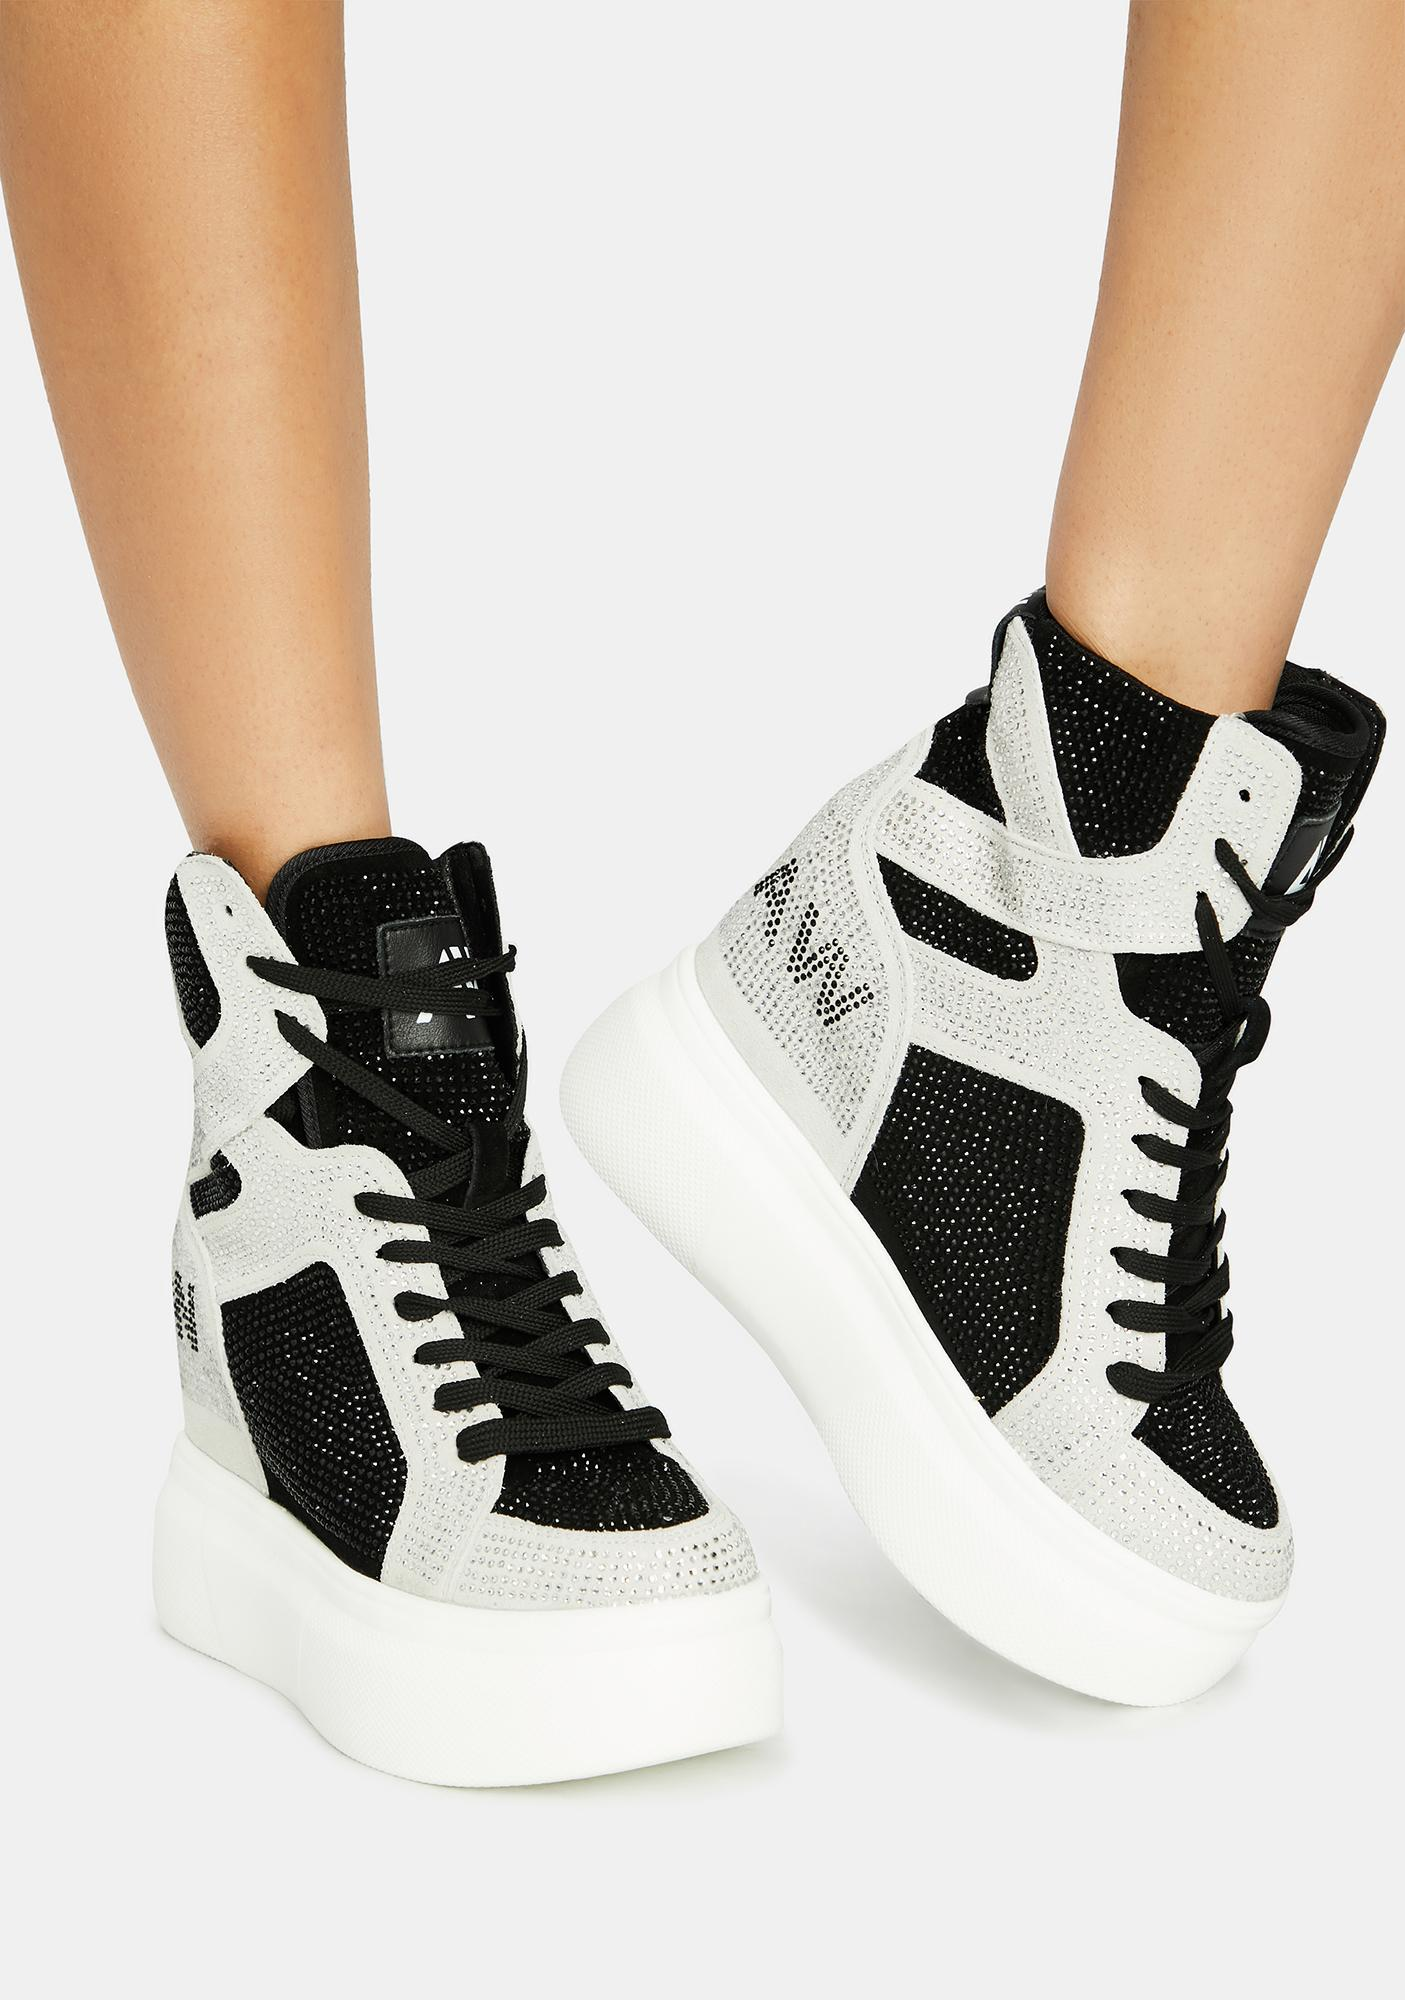 Anthony Wang Ice Lemon Sneakers